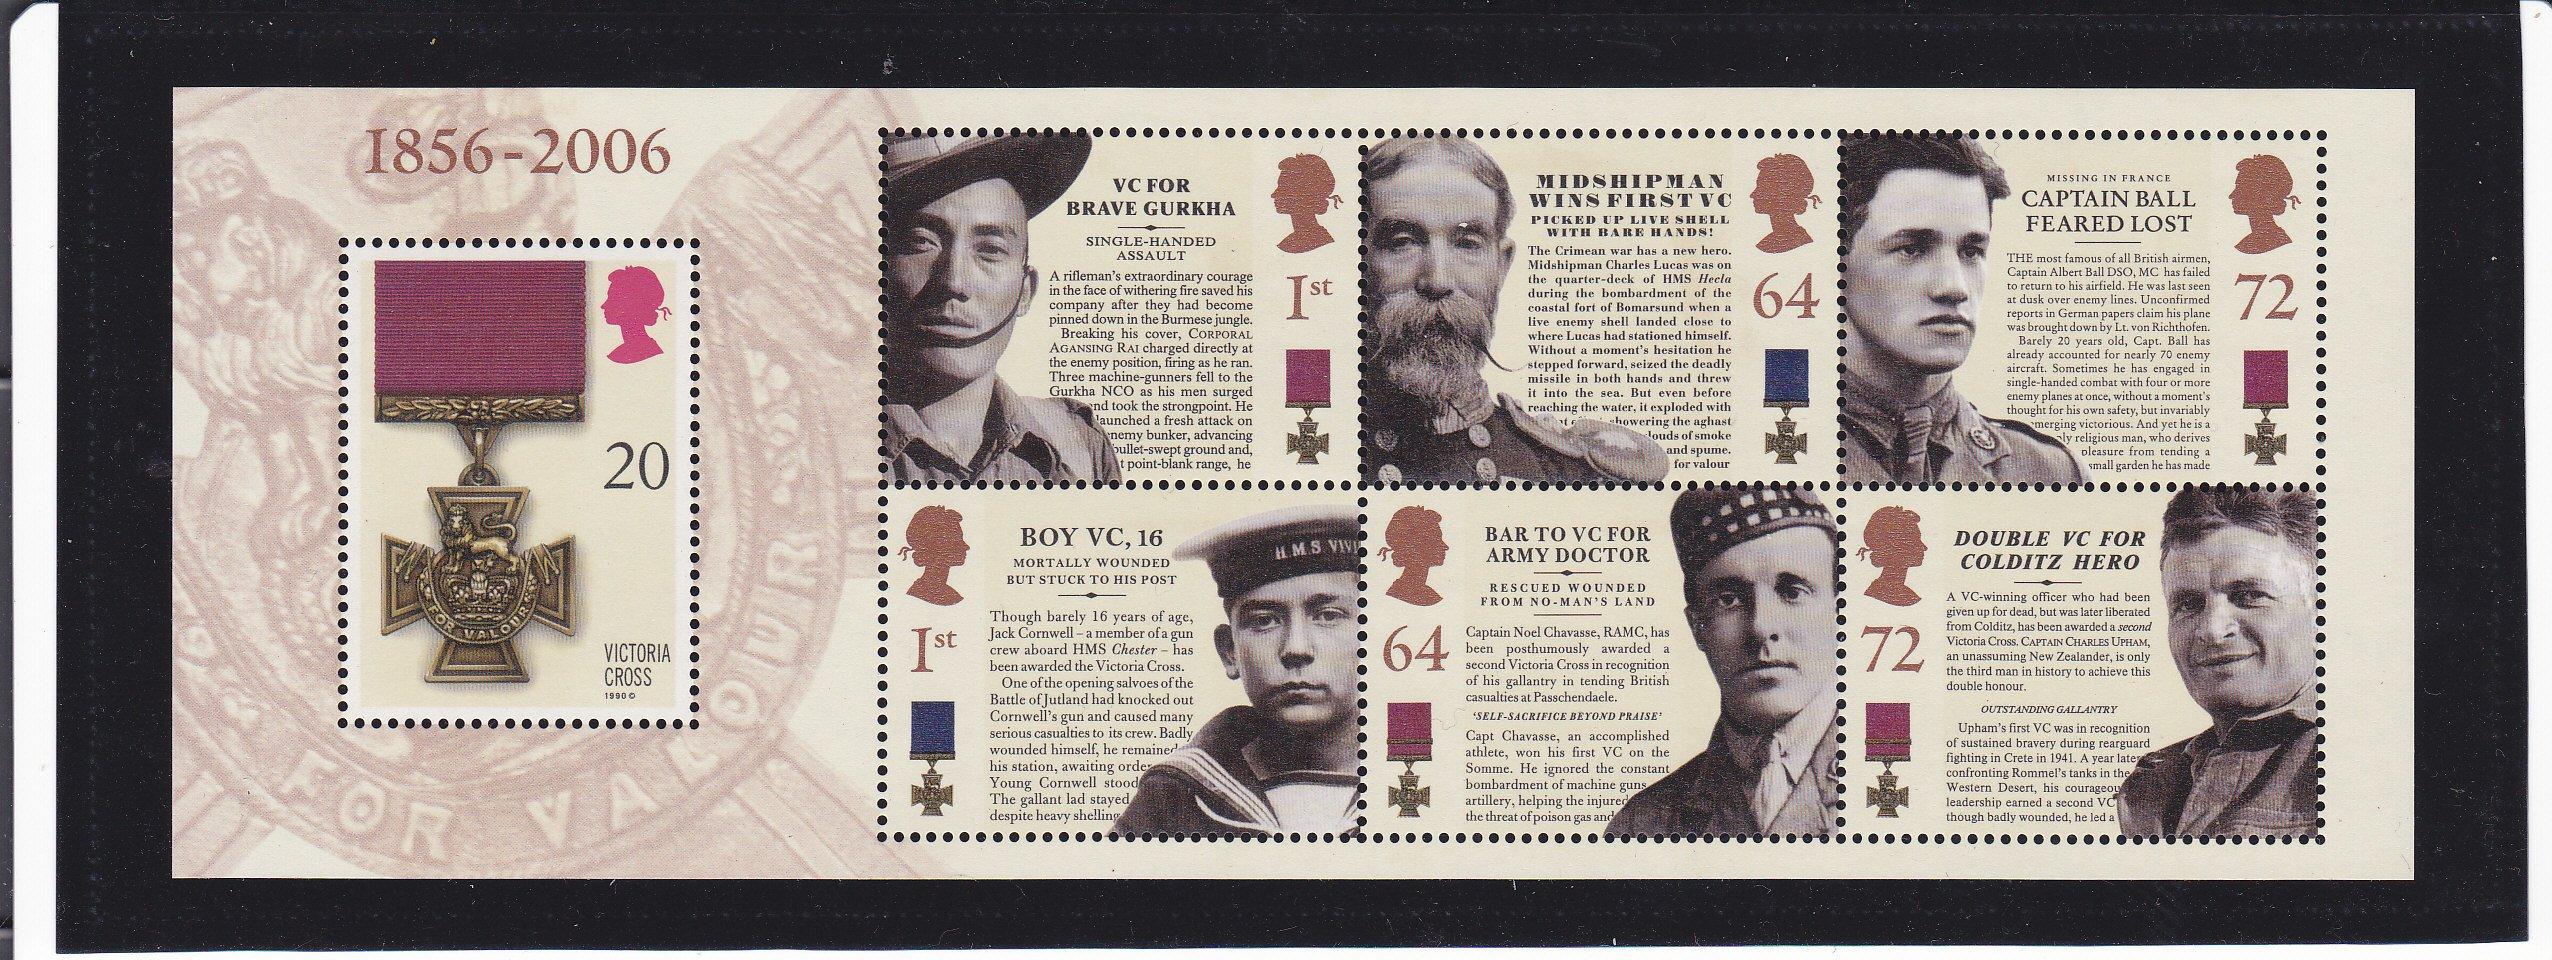 Miniature Sheet MS2665 Victoria Cross